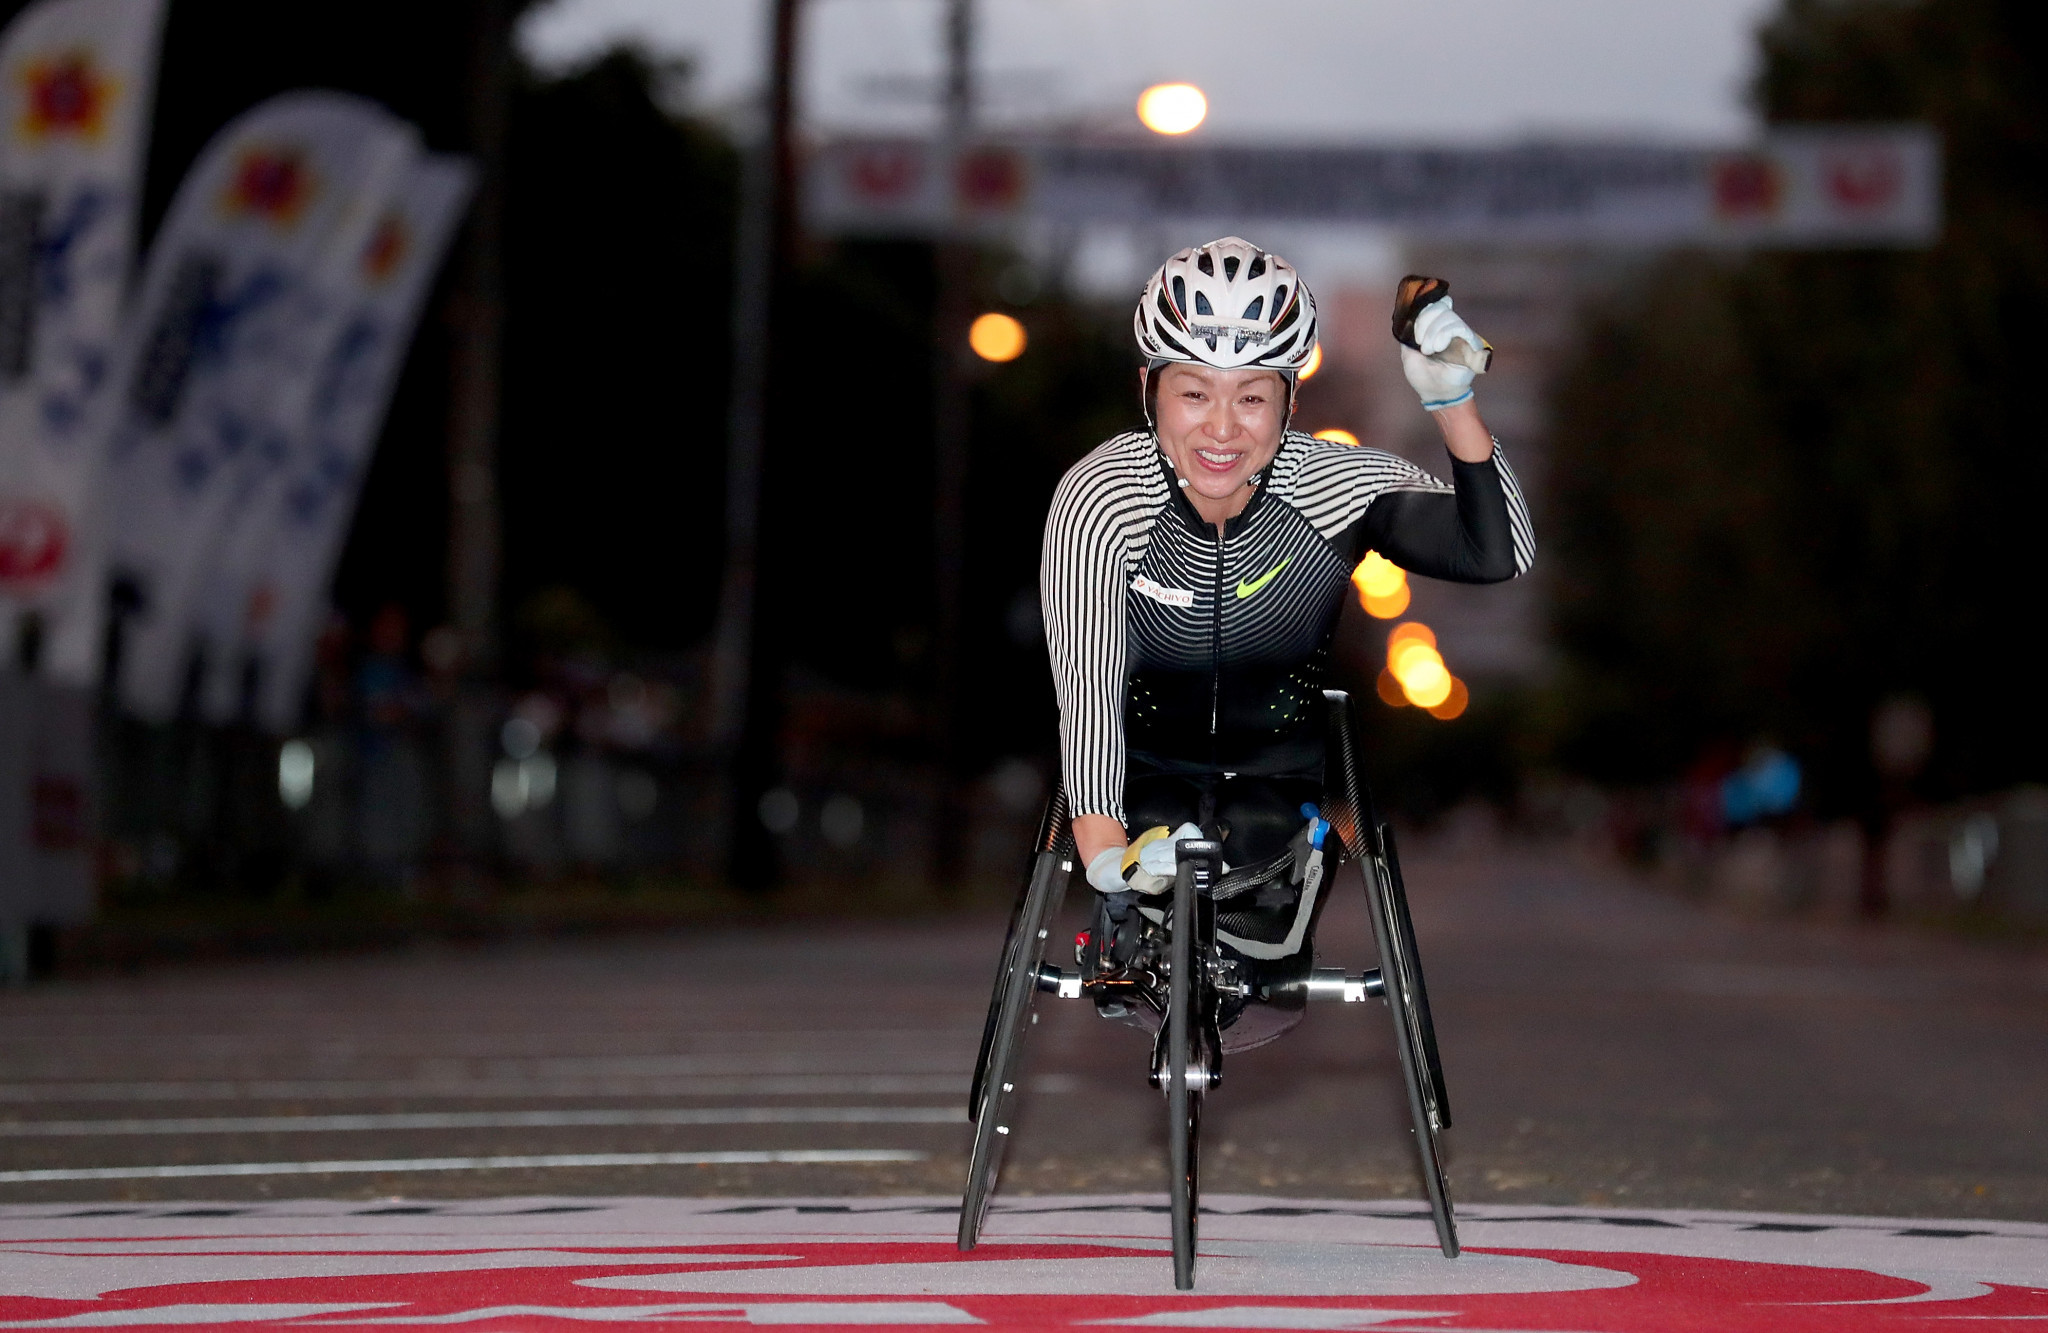 Japanese athlete Wakako Tsuchida is set to star in paratriathlon at Tokyo 2020 ©Getty Images